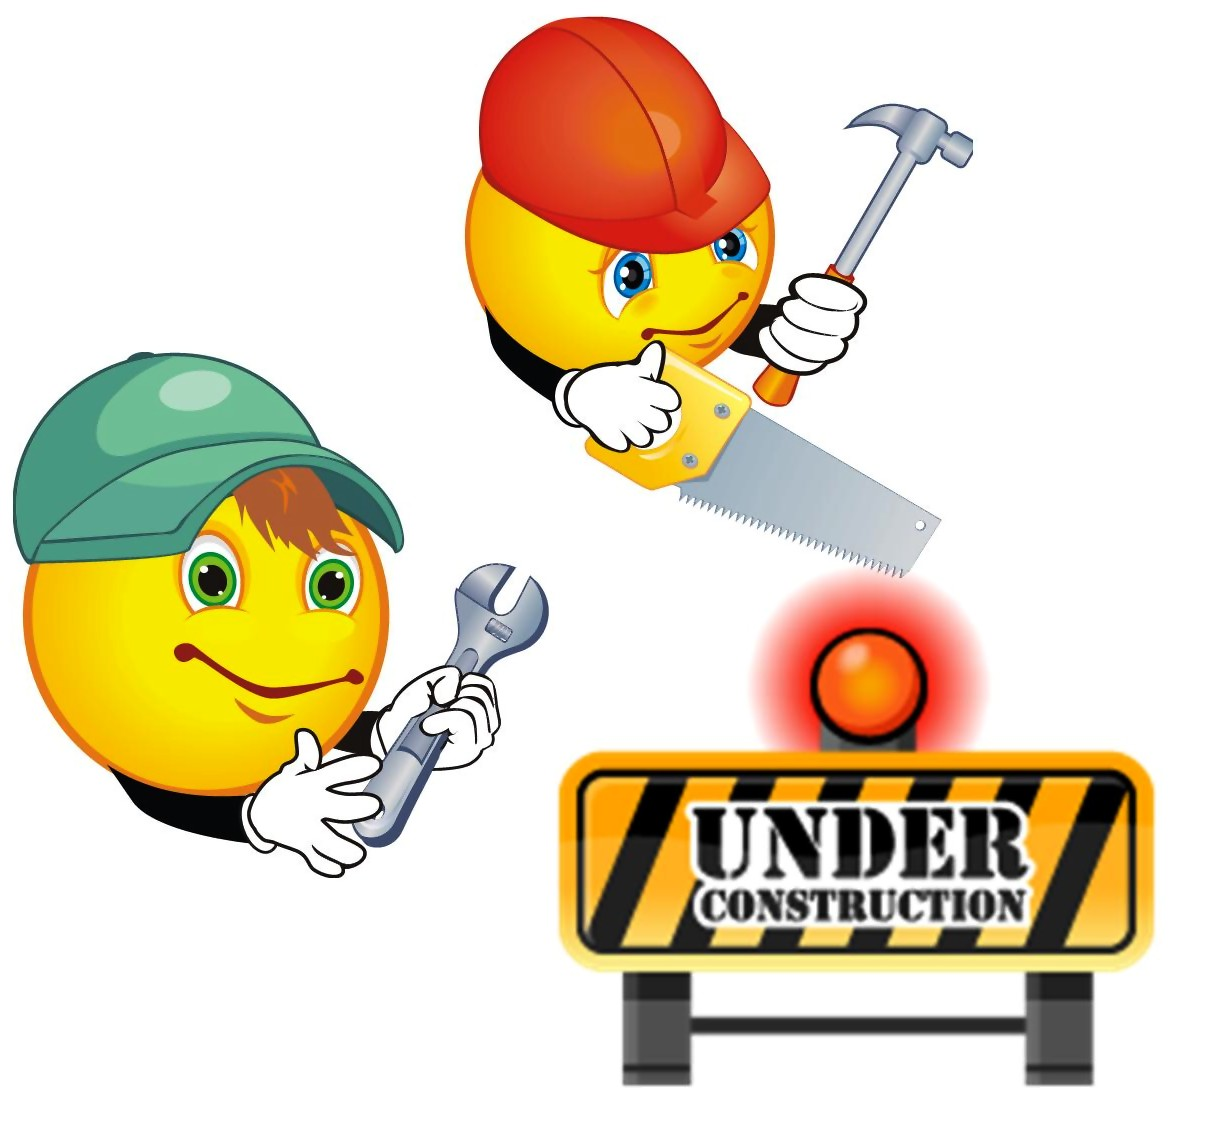 Construction Symbols Clip Art N2 free image